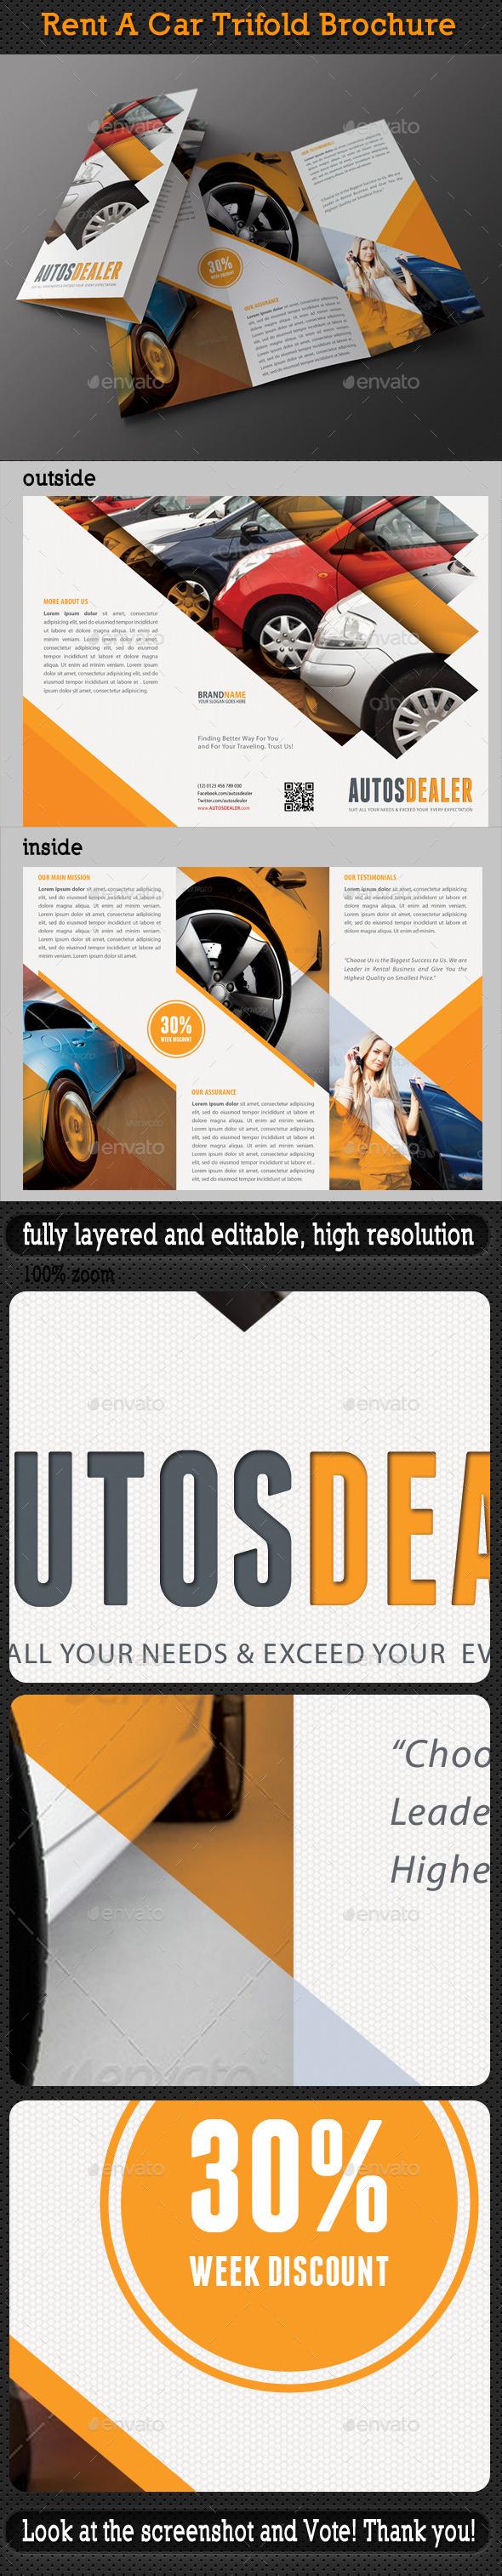 Rent A Car Trifold Brochure 05